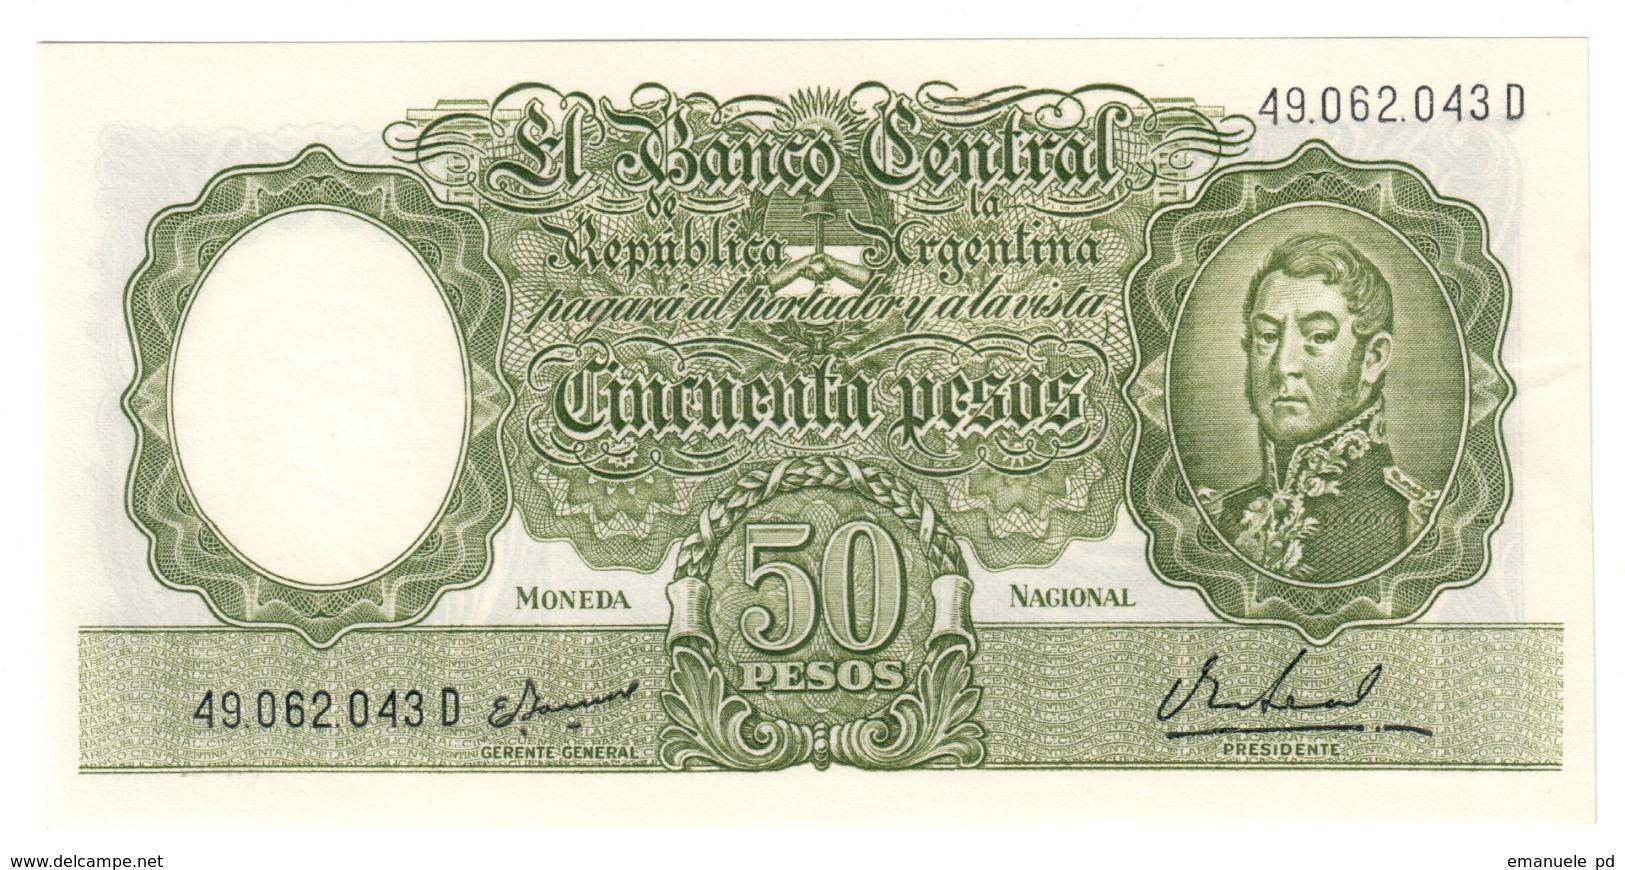 ARGENTINA50PESO1955P271UNCGerente General / Presidente 271A.CV. - Argentina